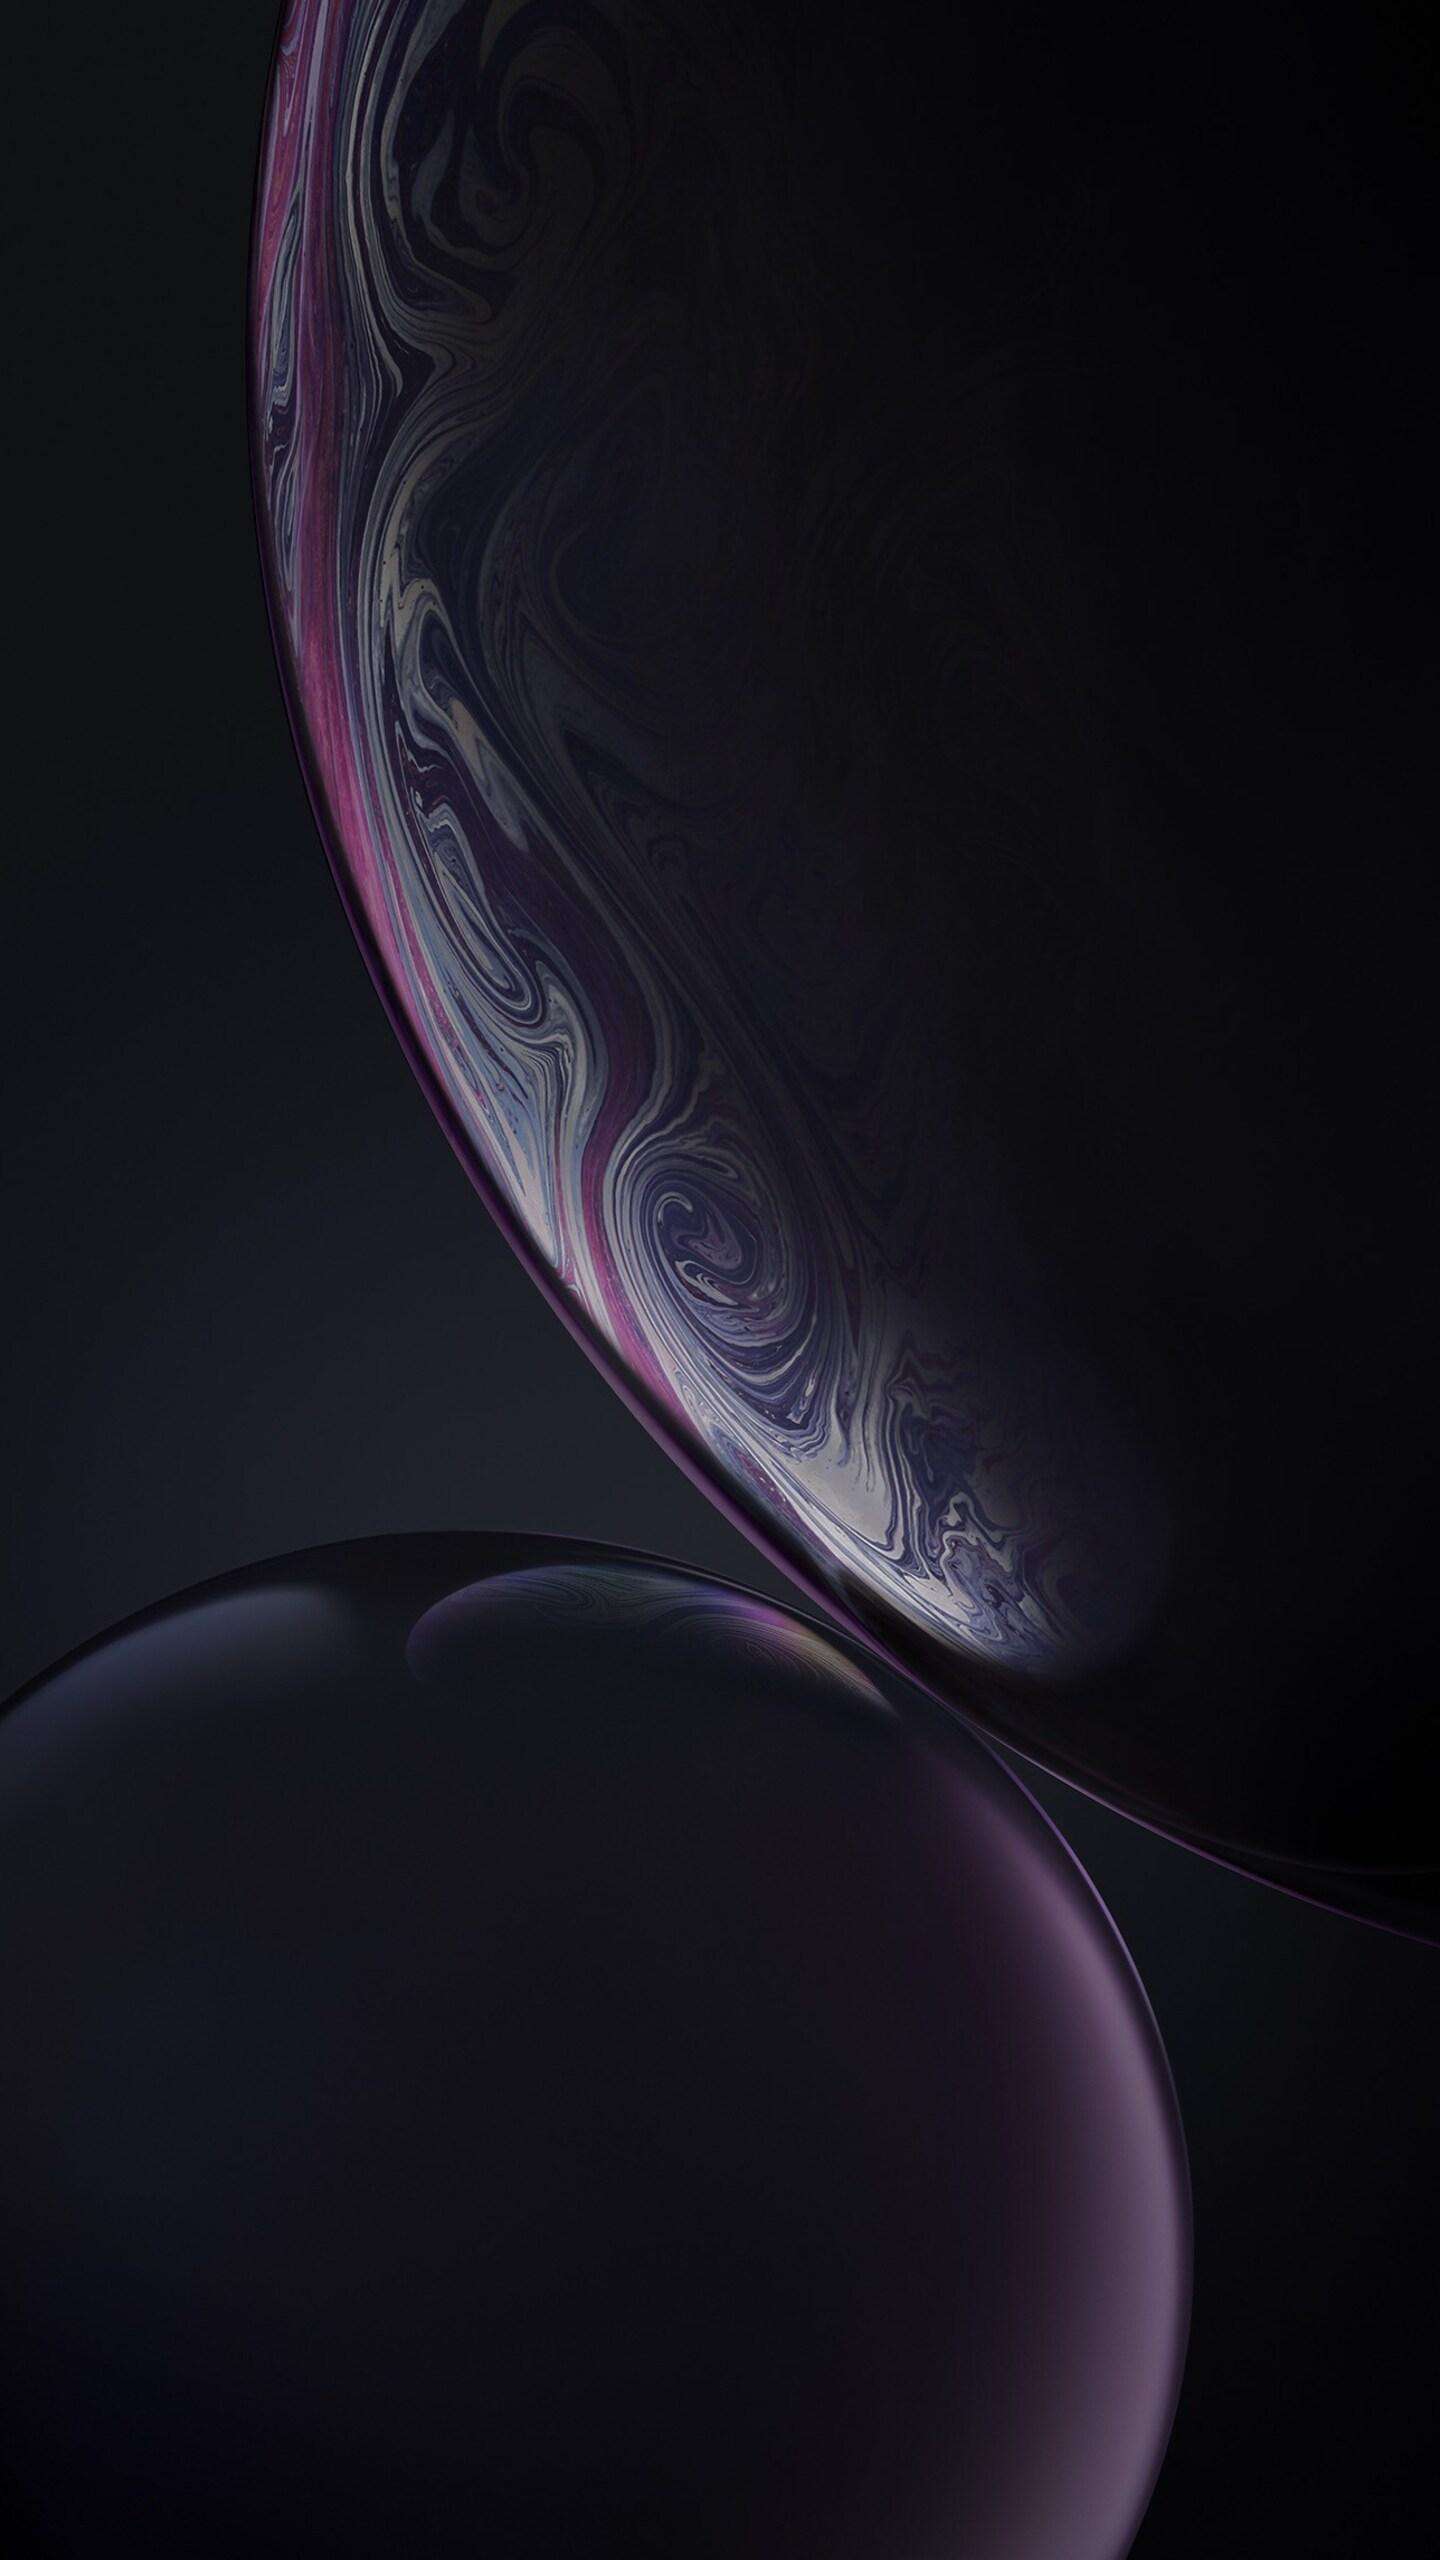 1440x2560 Ios 12 Samsung Galaxy S6,S7 ,Google Pixel XL ...